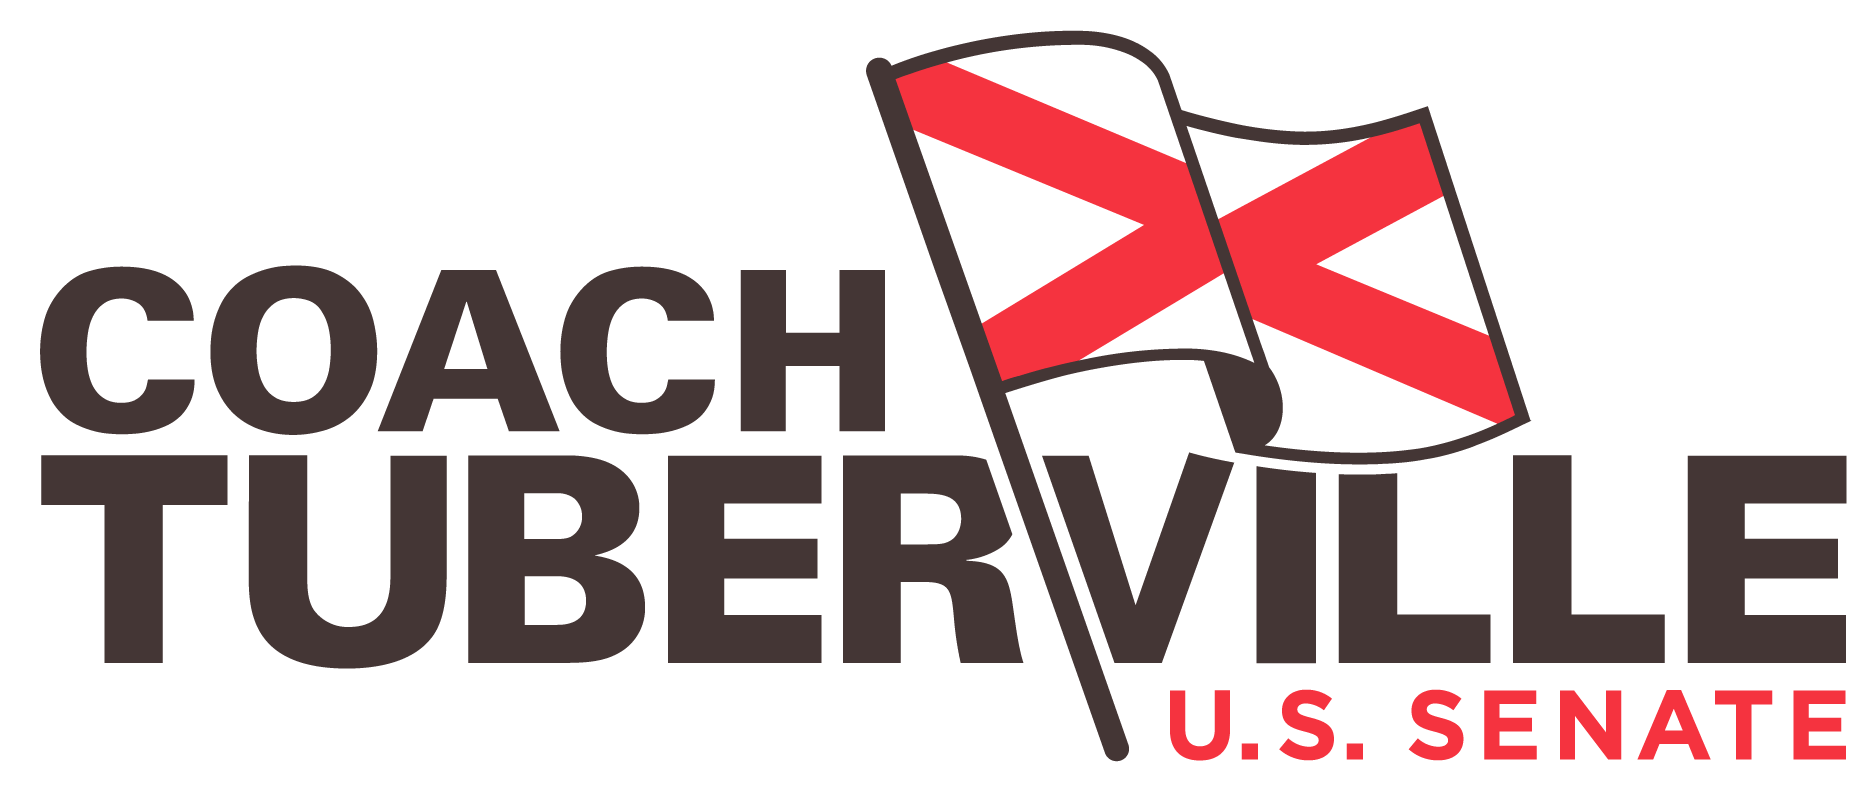 Coachtuberville logo fullcolor